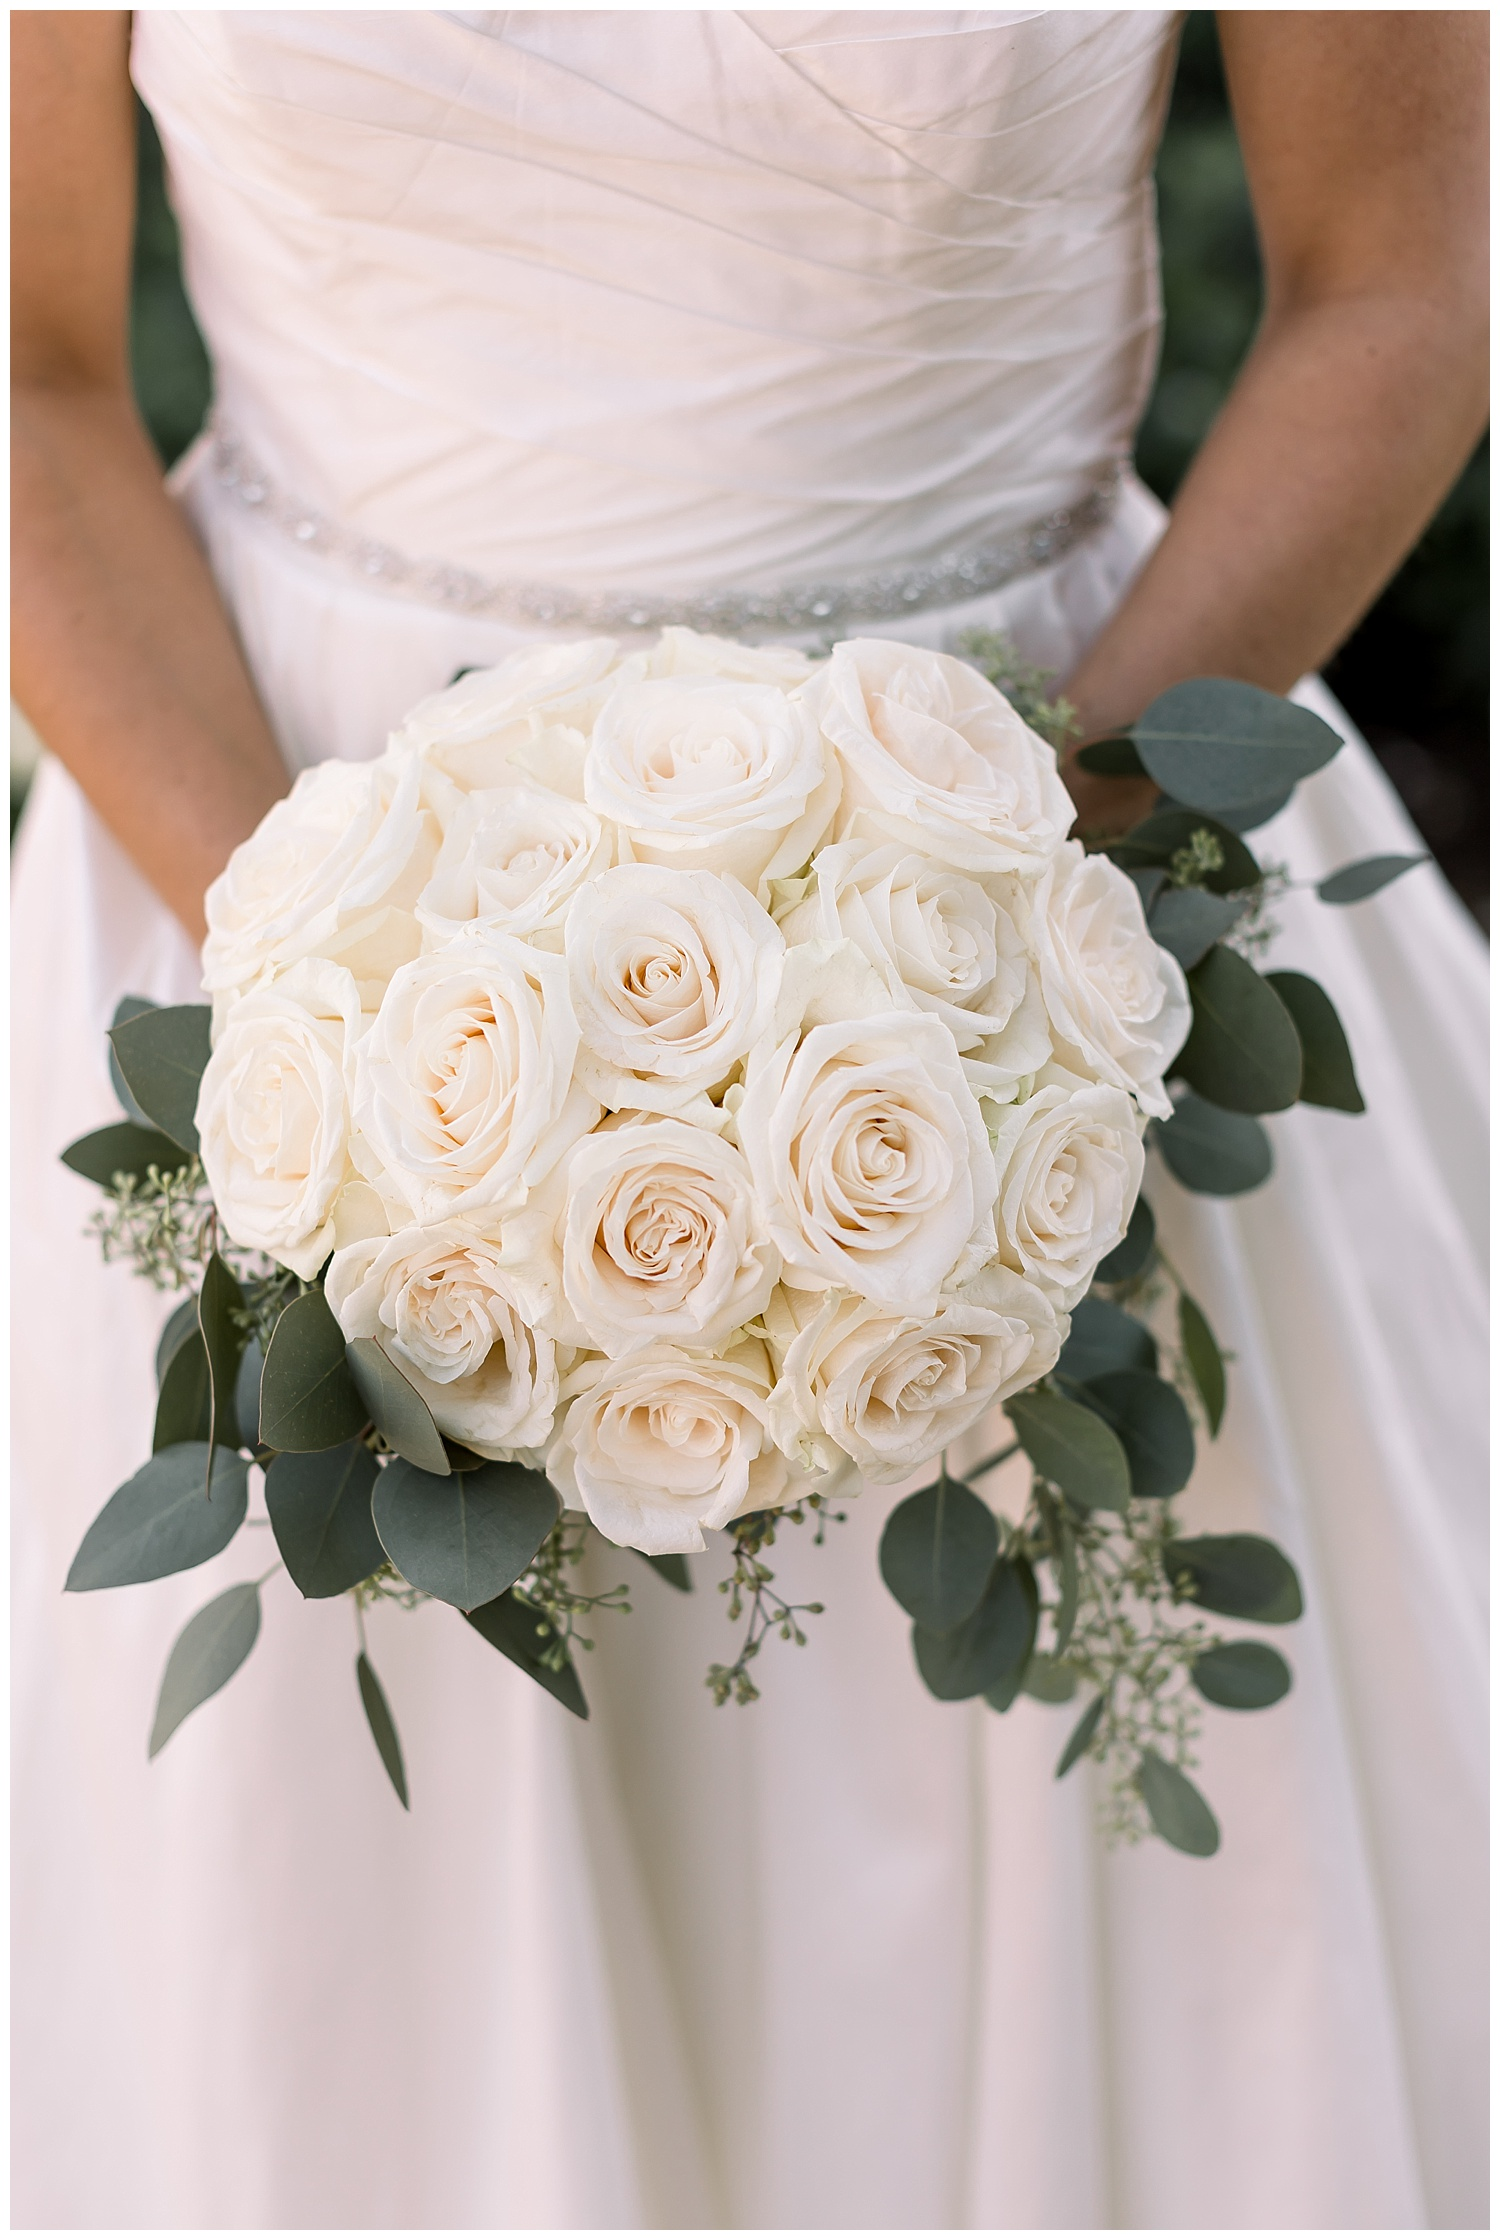 the-barns-summer-bridal-bouquet-ags-photoart.jpg